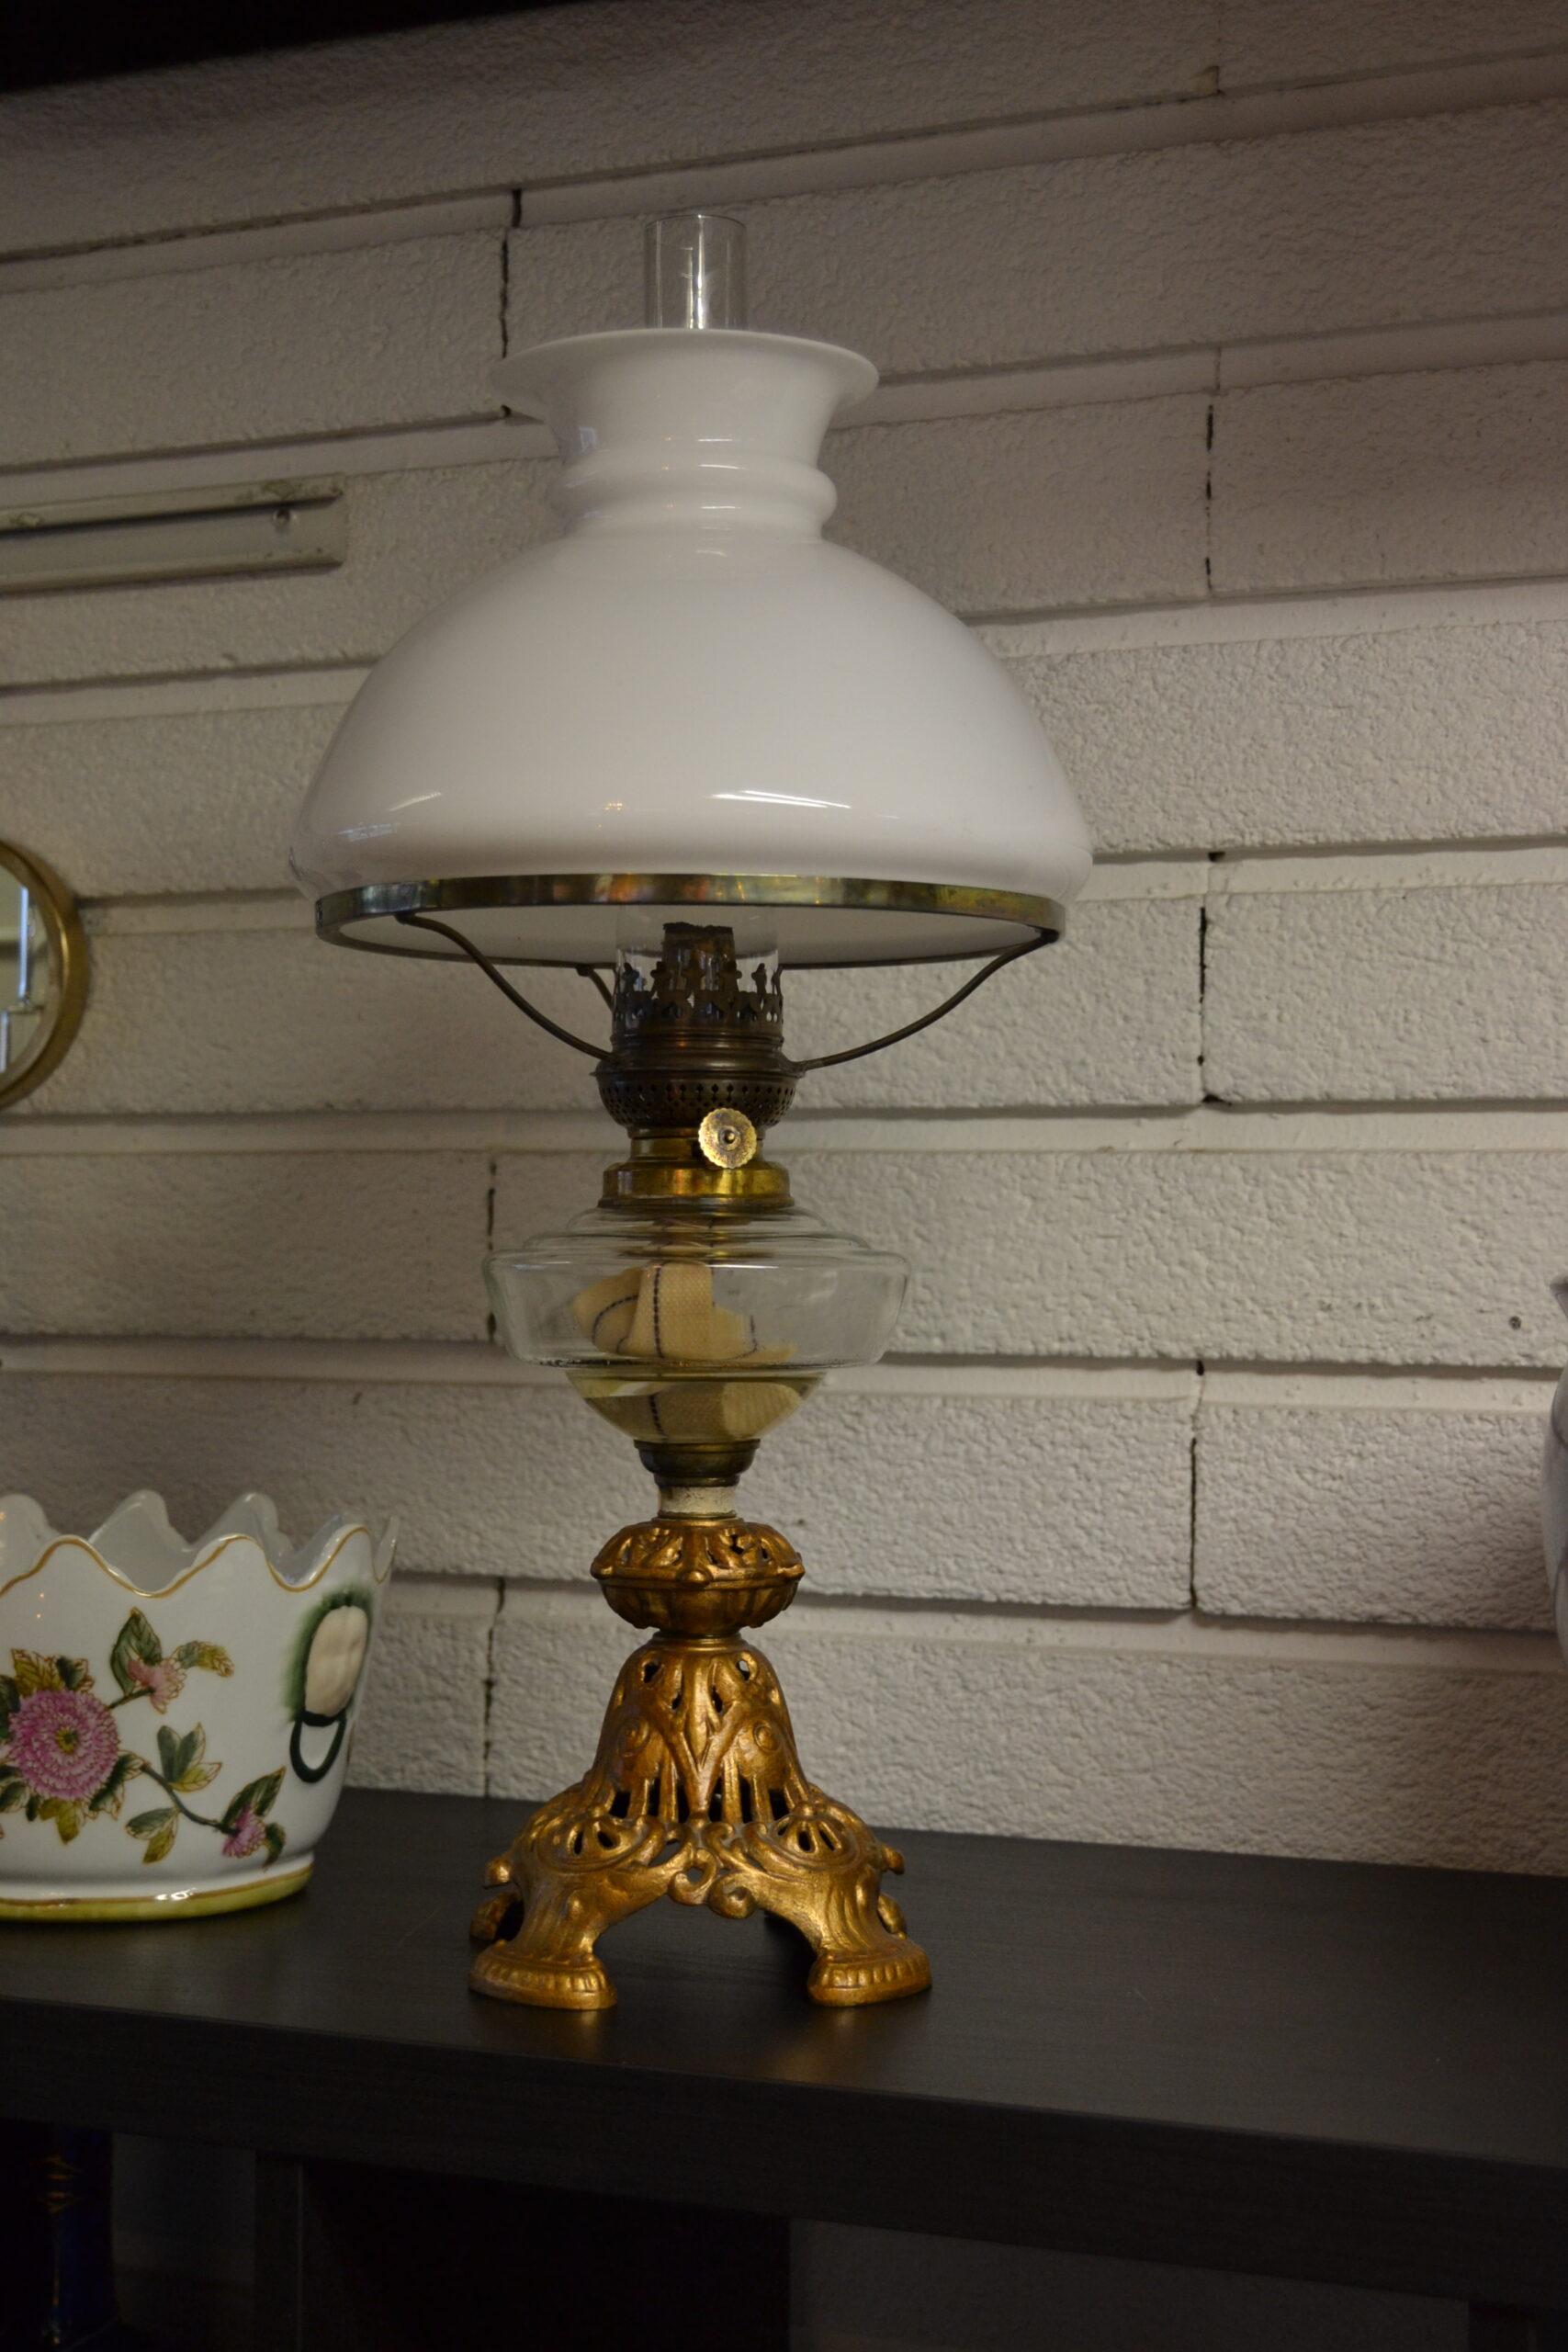 Fotogenlampa Lampfot metall oljehus i glas